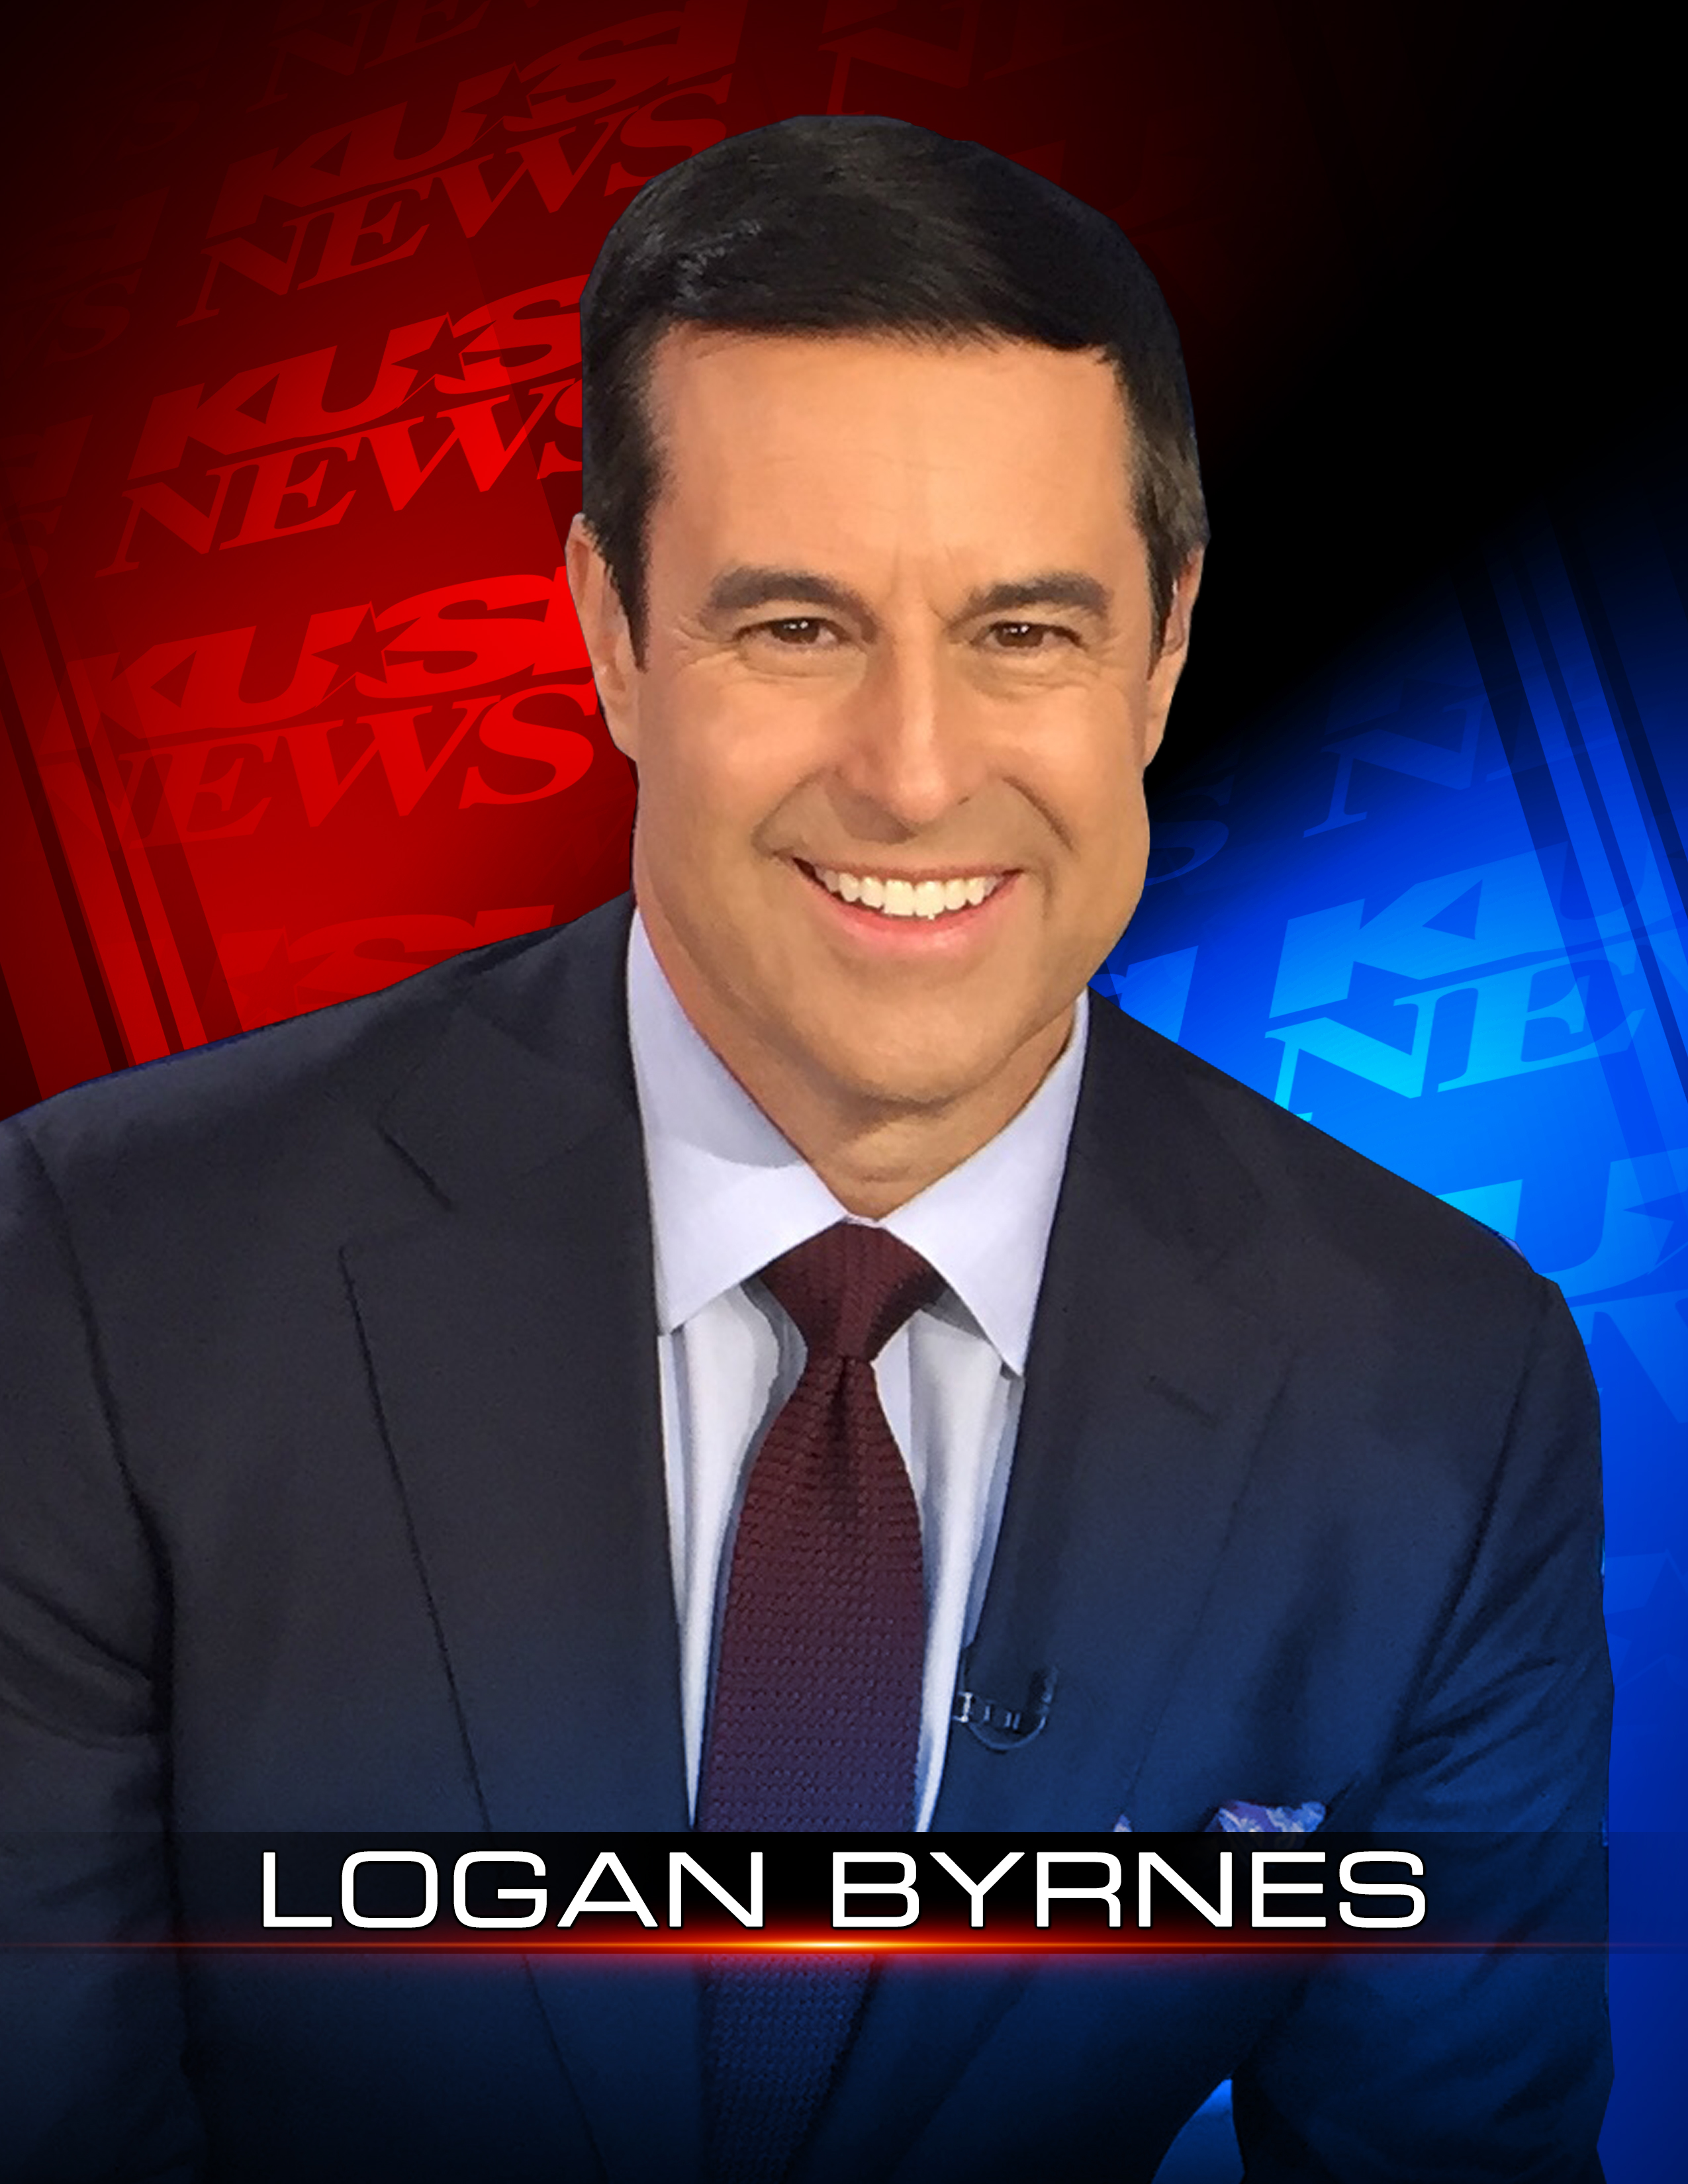 Image Of News Today Fox 11 Fox 11 Five OClock News Video KTTVFox 11